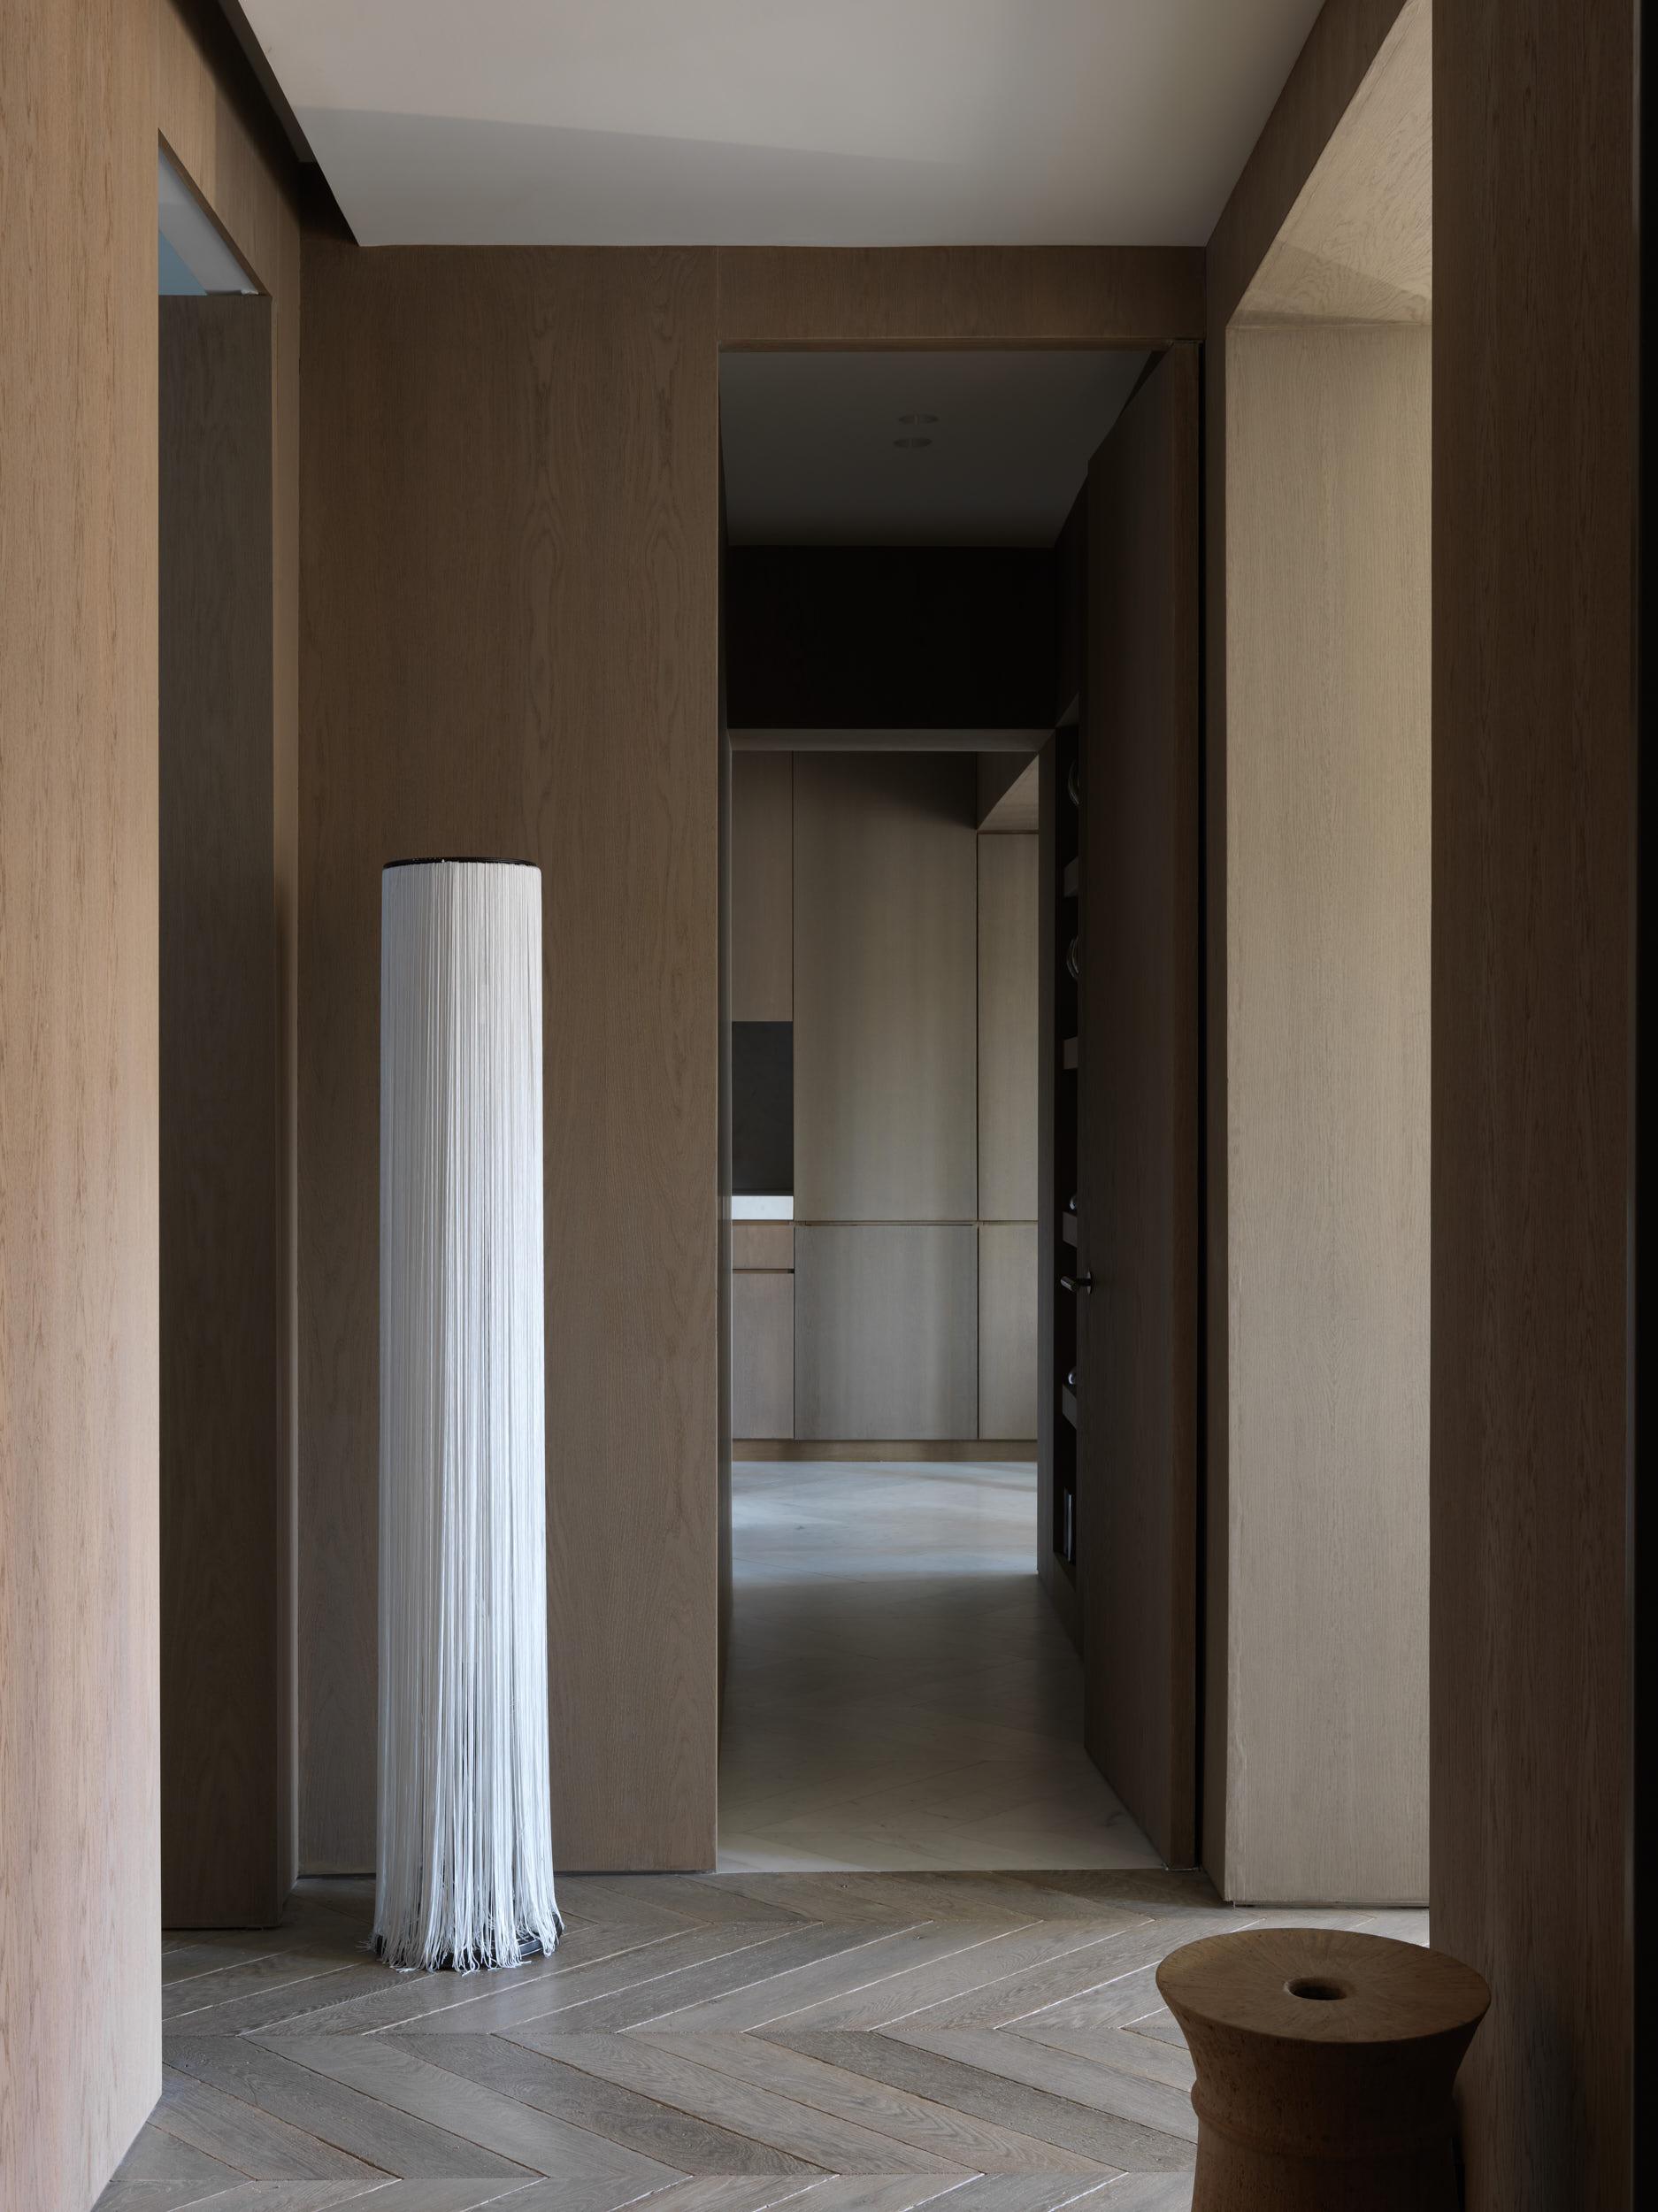 JR Apartement by Nicolas Schuybroek —  Photo by Stephan Julliard